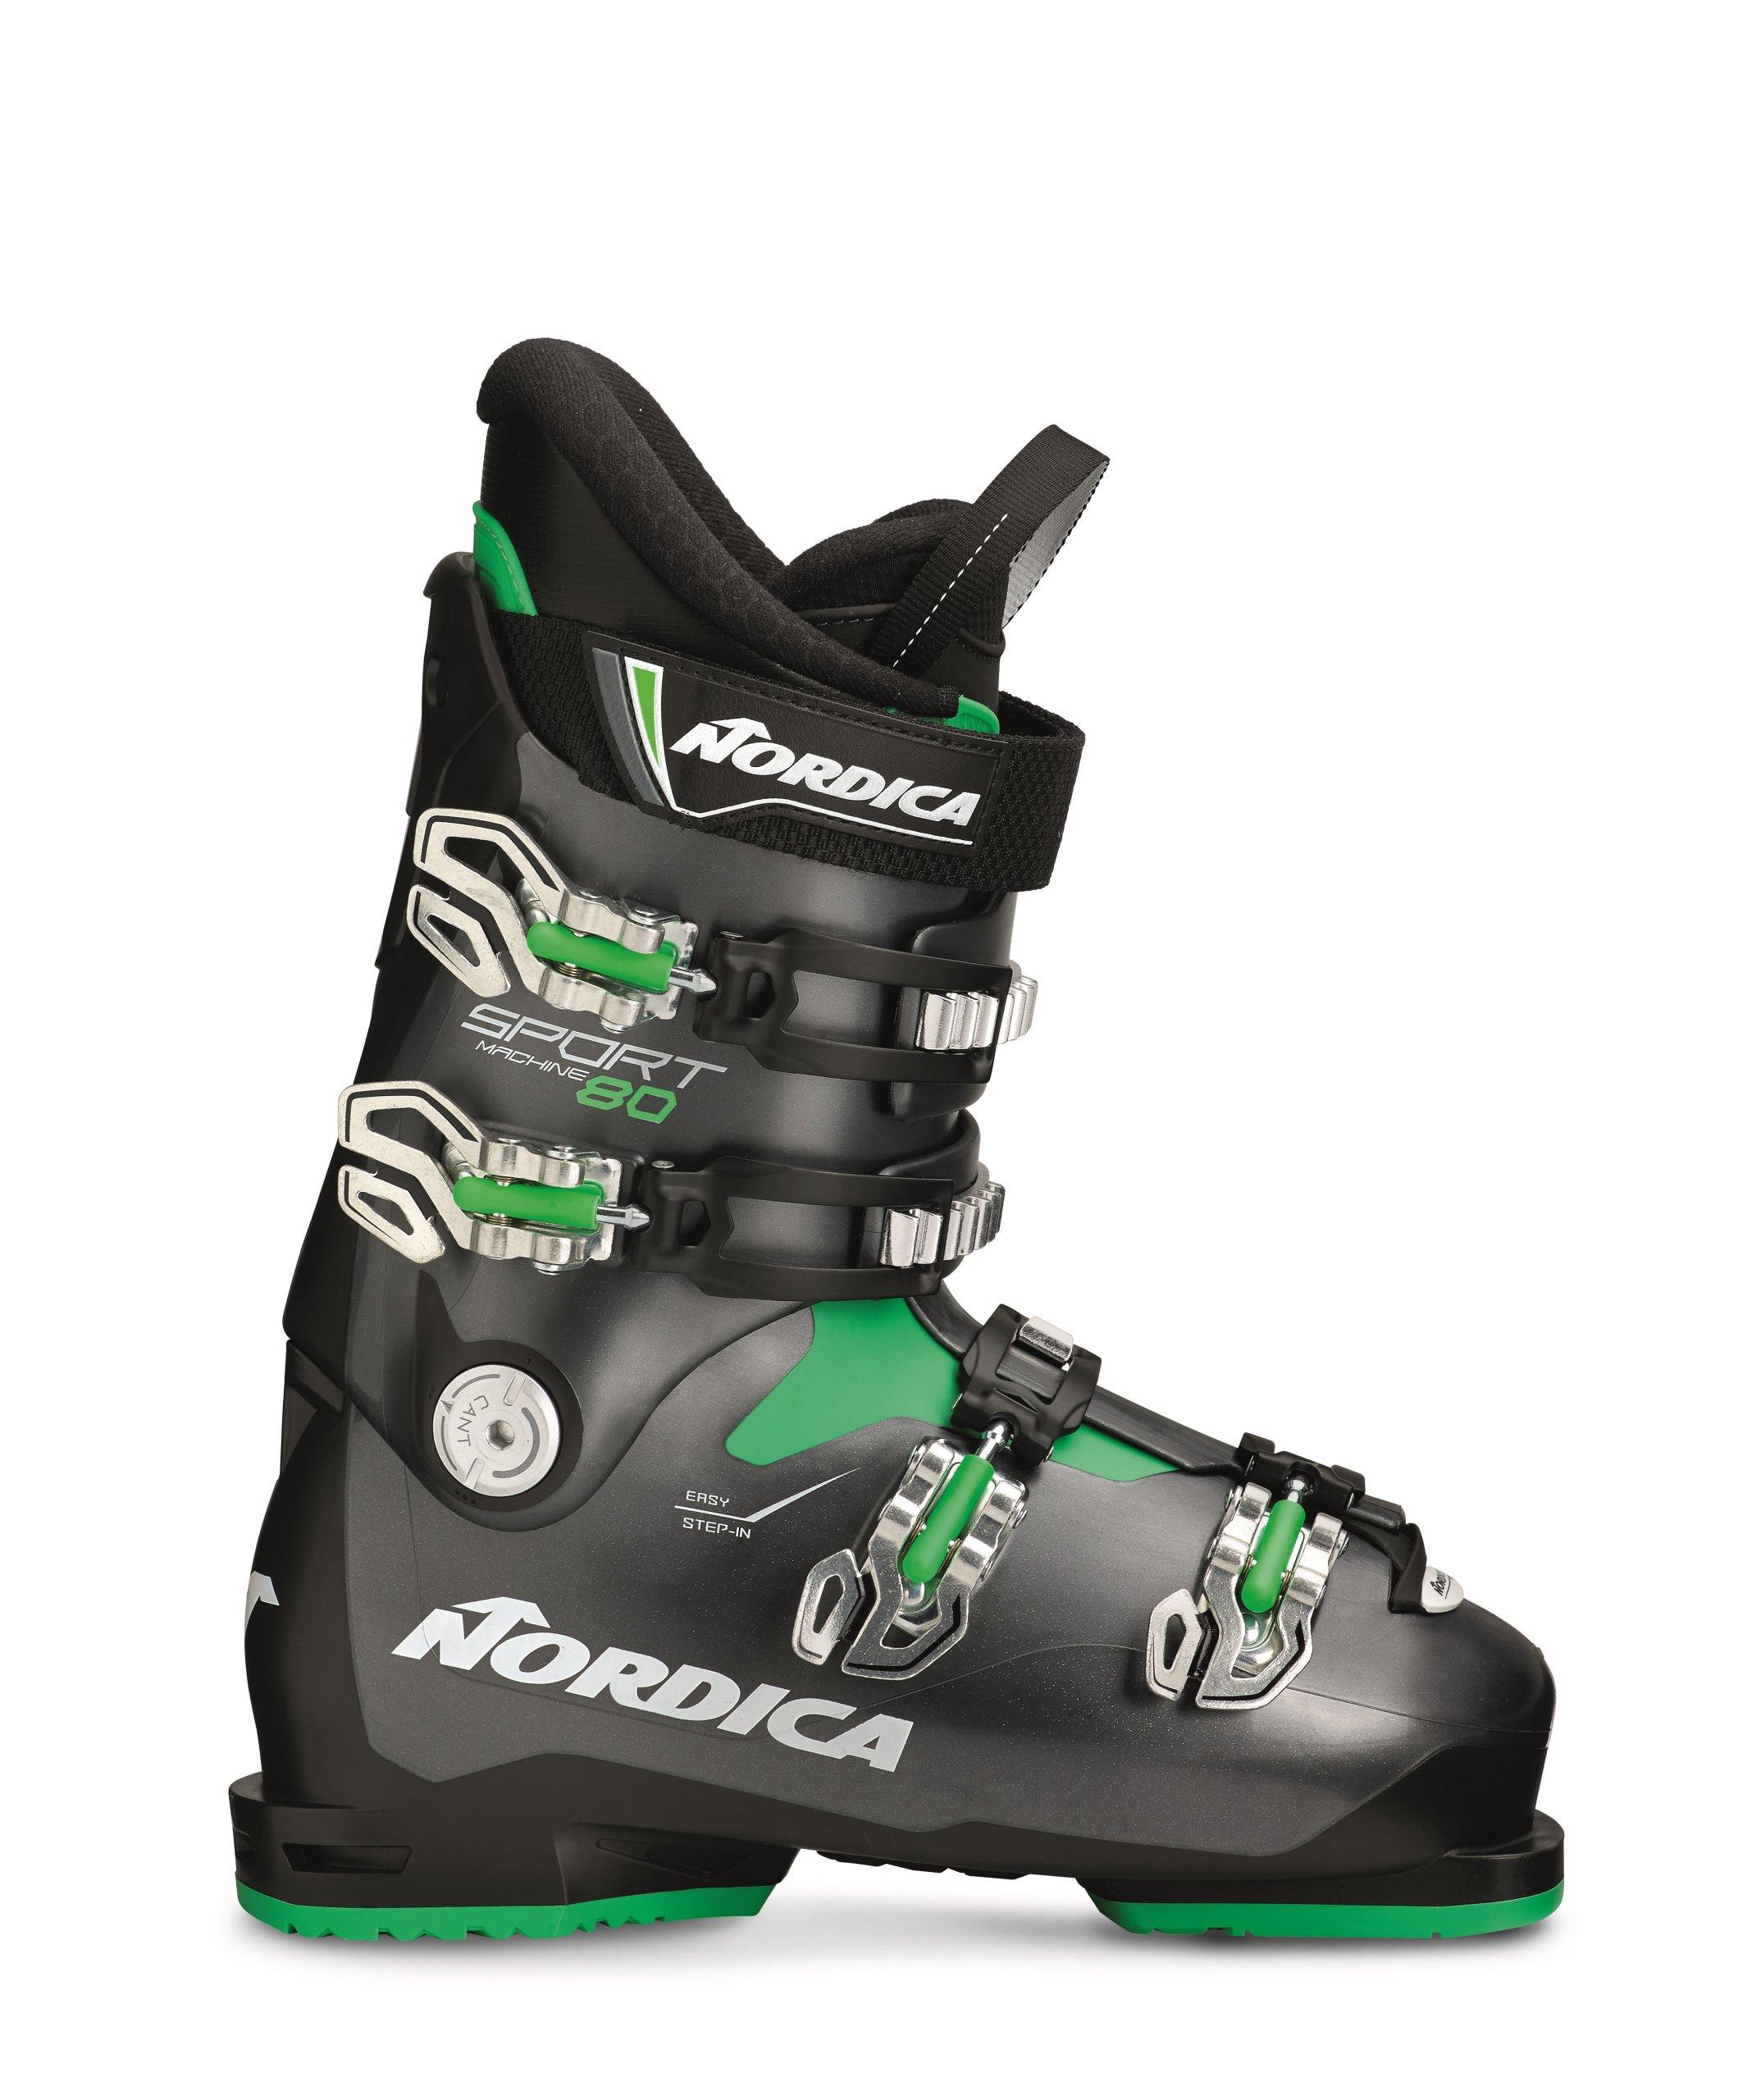 Buty Nordica SportMachine 90R rozm. 26.0 ski24_pl